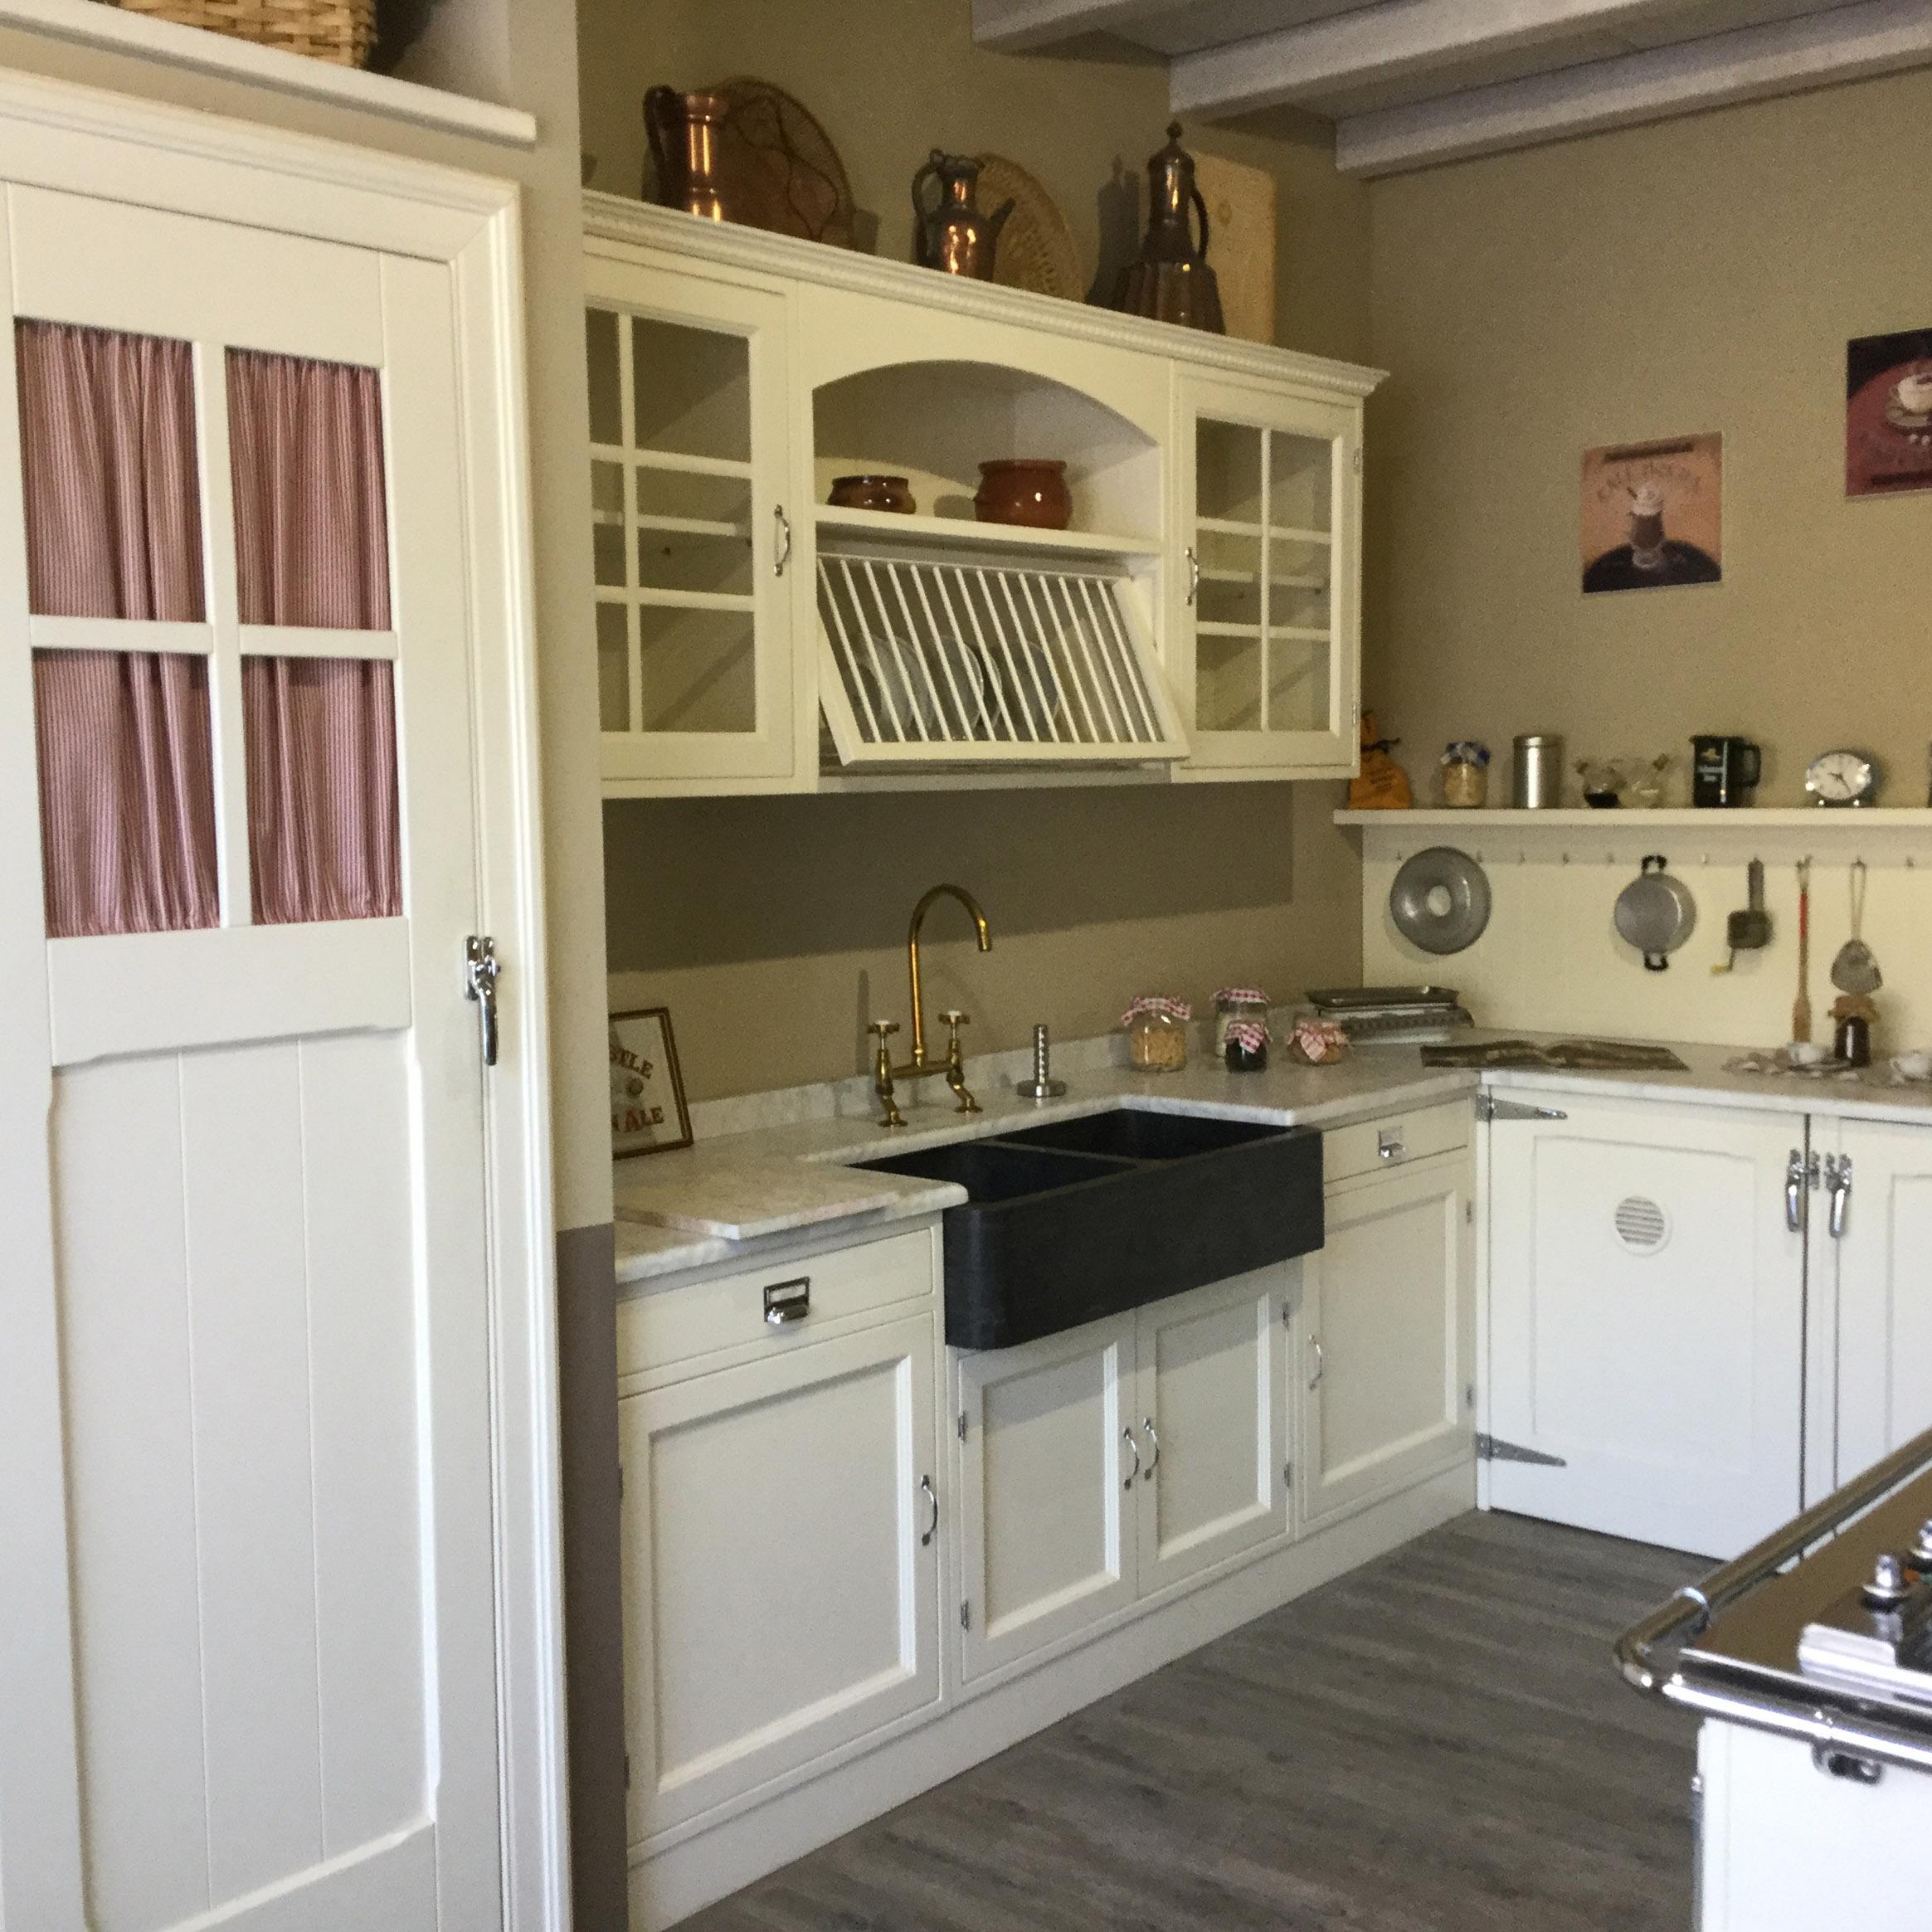 Marchi cucine cucina old england scontata del 45 - Marchi cucine outlet ...